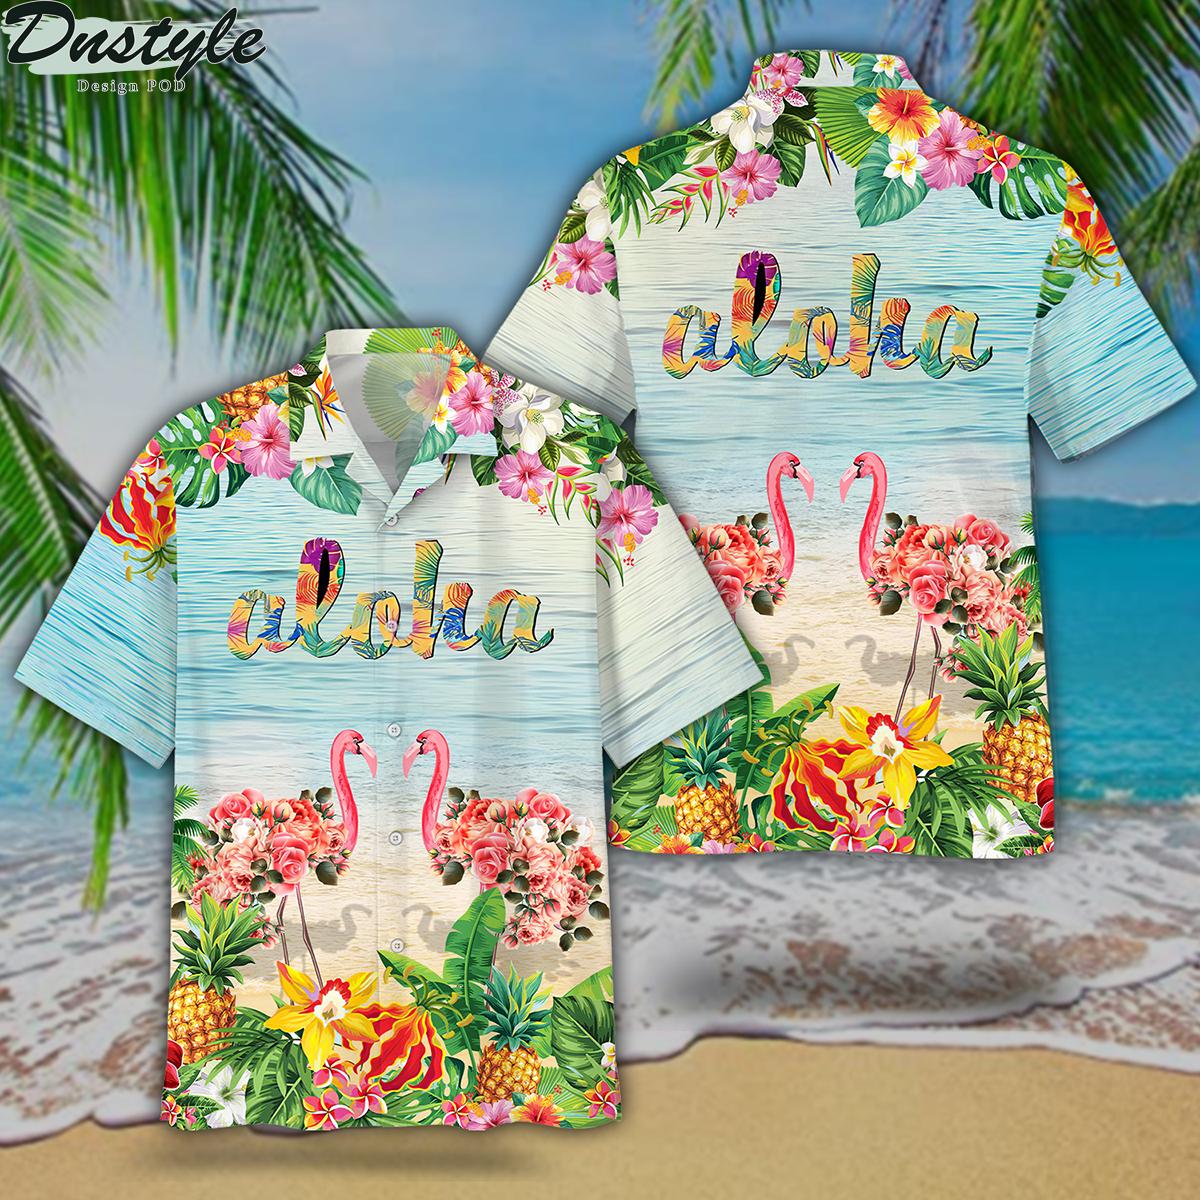 Flamingo couple floral aloha hawaiian shirt